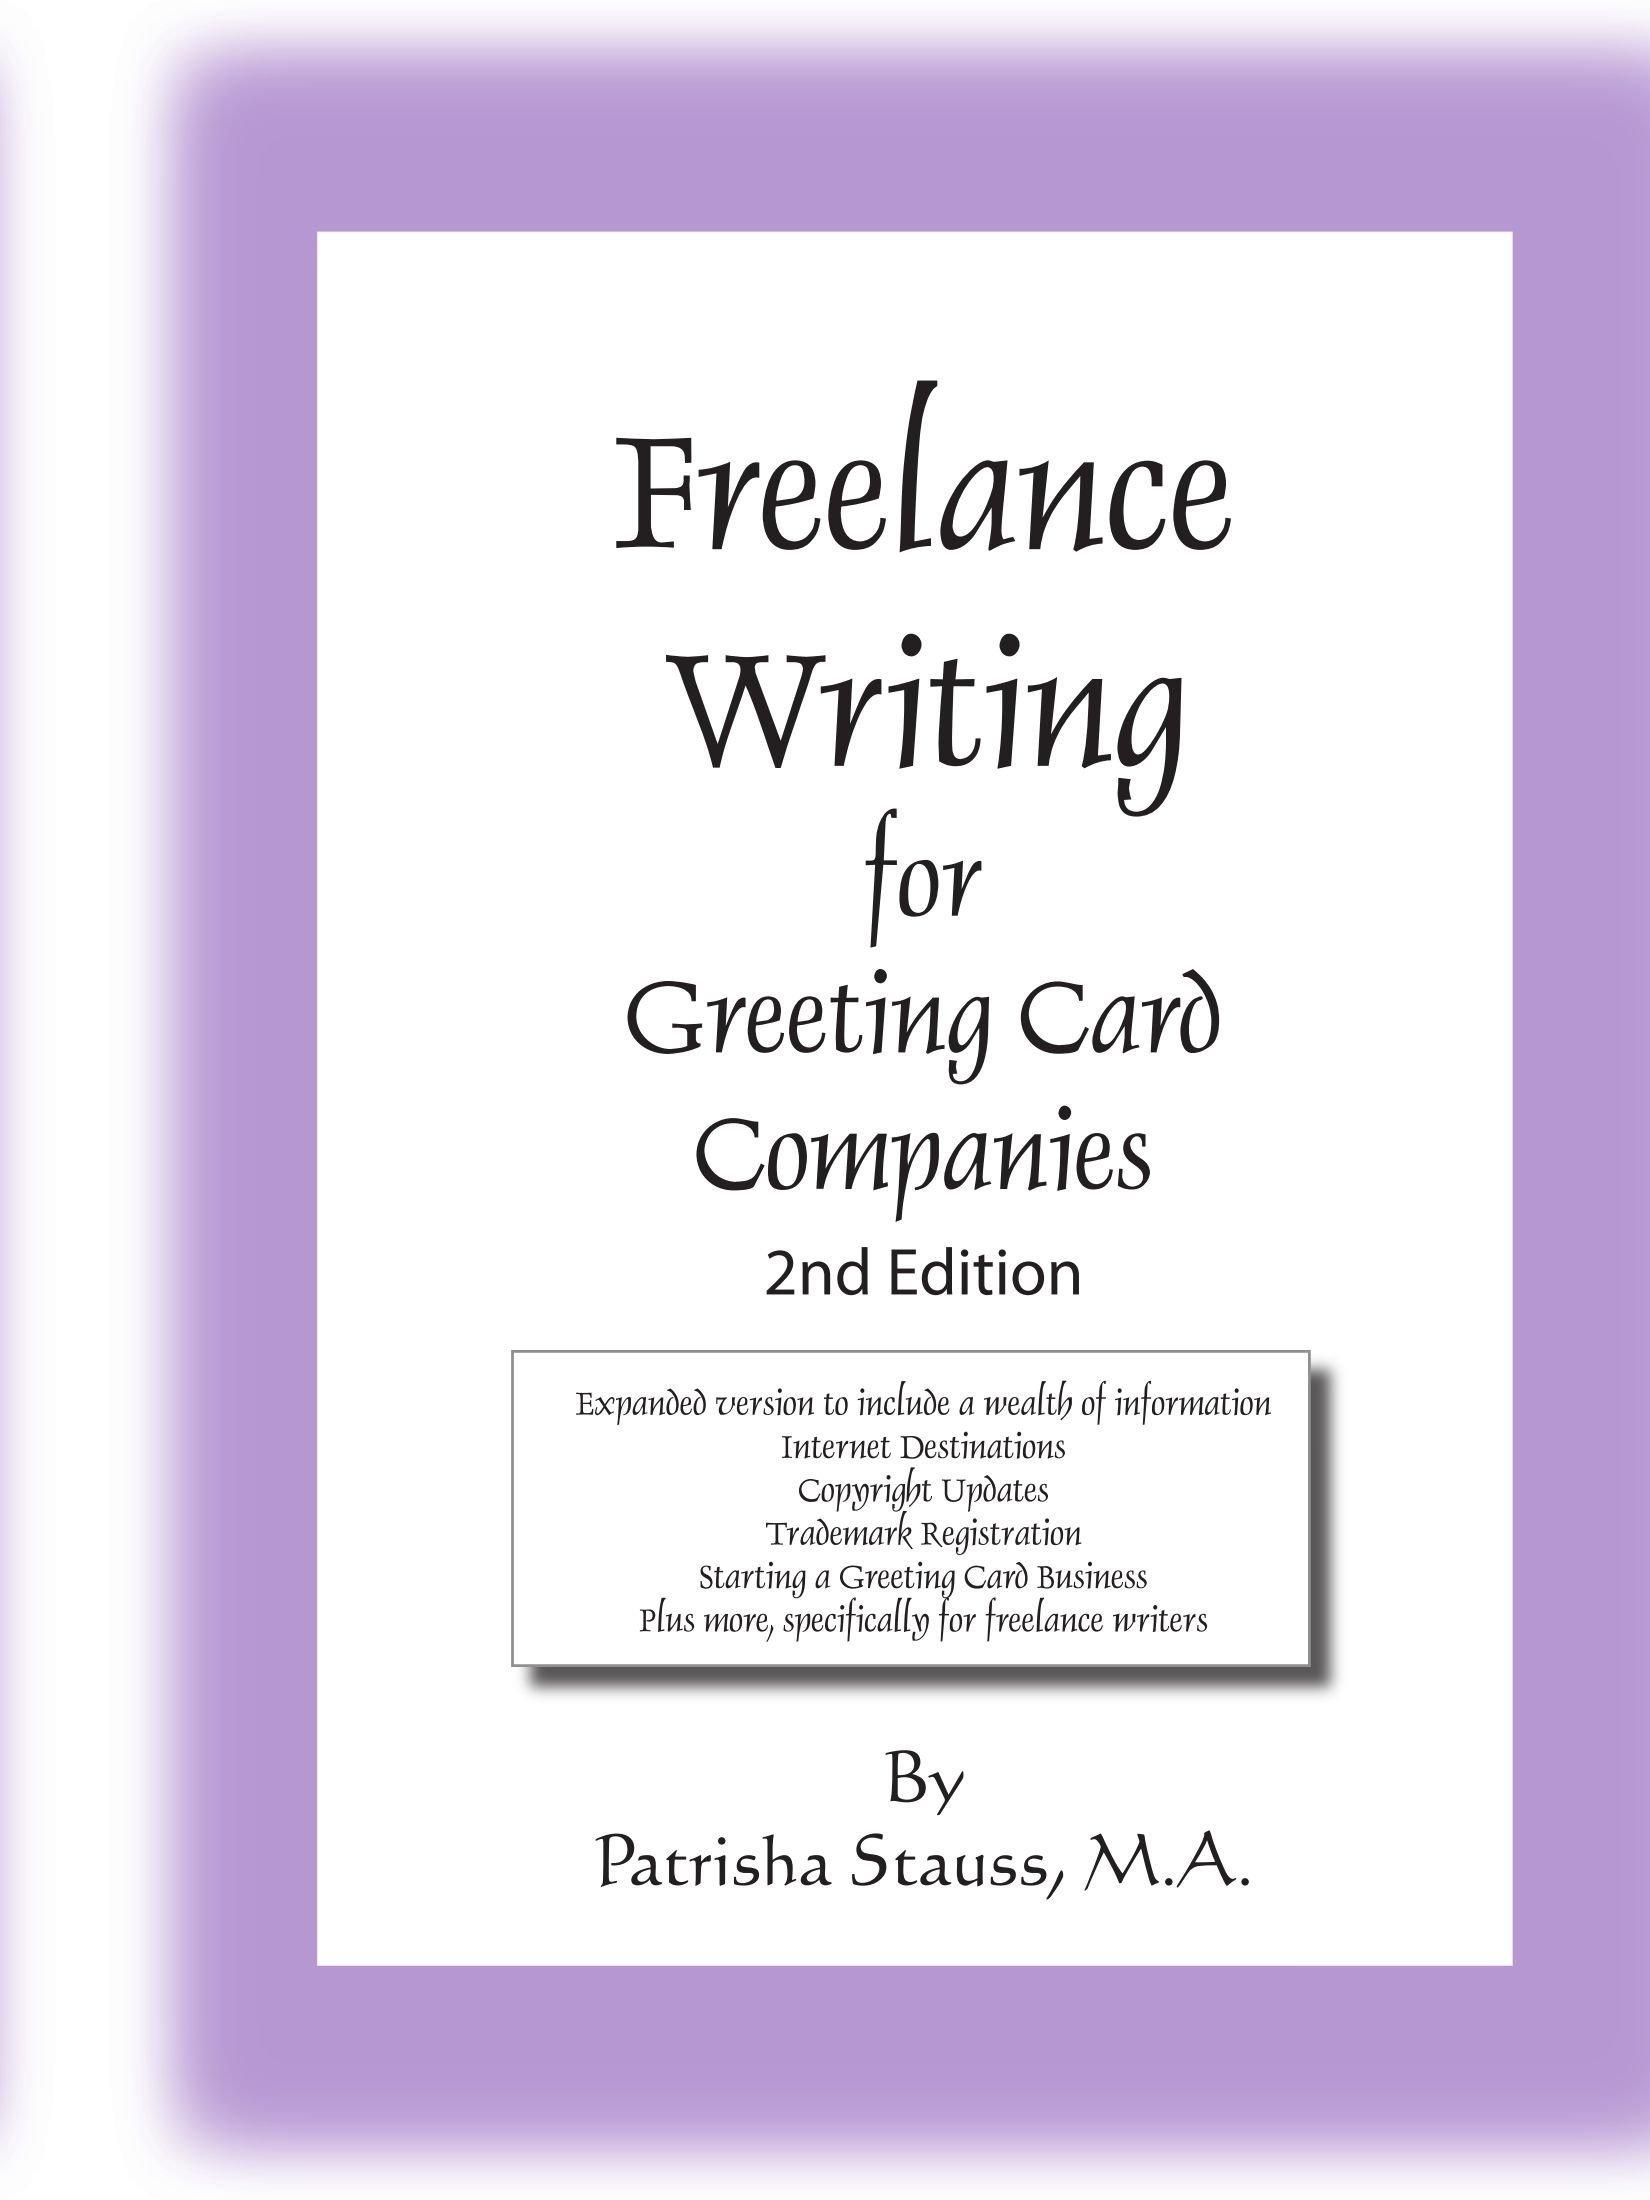 Freelance writing for greeting card companies 2nd edition amazon freelance writing for greeting card companies 2nd edition amazon patrisha stauss 9781425926984 books m4hsunfo